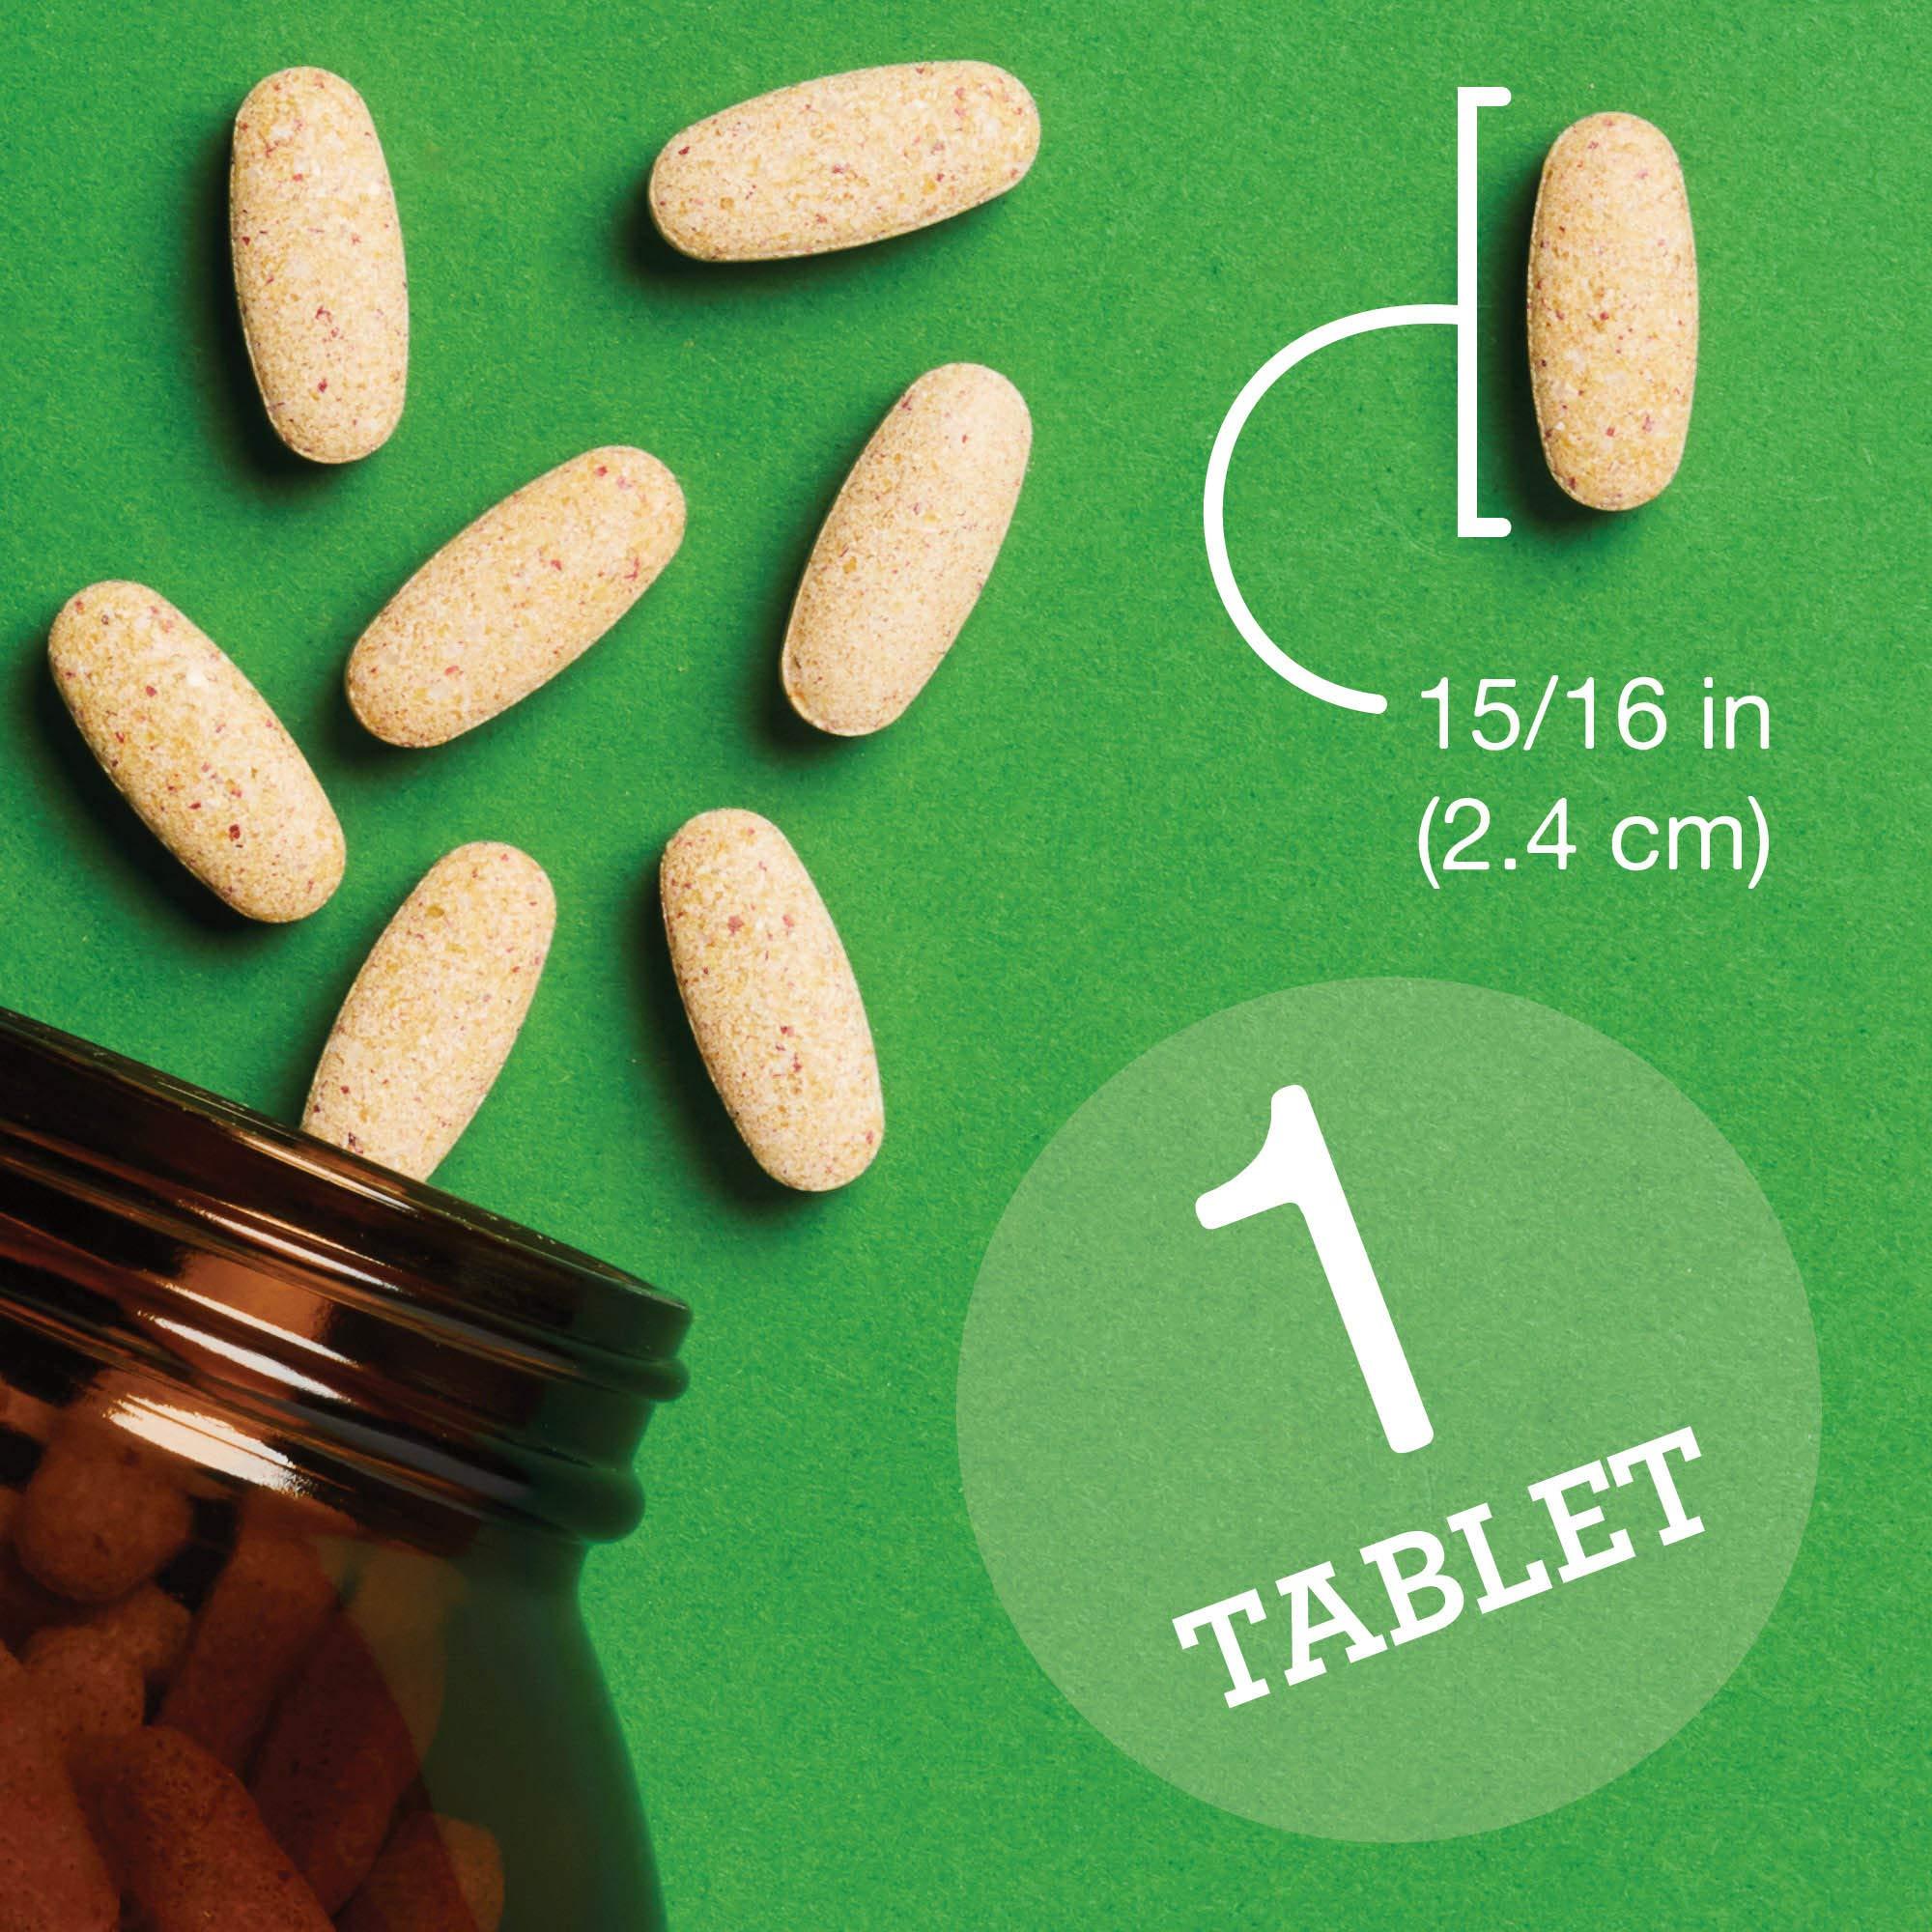 INNATE Response Formulas - Vitamin C-400, Gentle and Effective Immune Support, 180 Tablets by INNATE Response Formulas (Image #3)